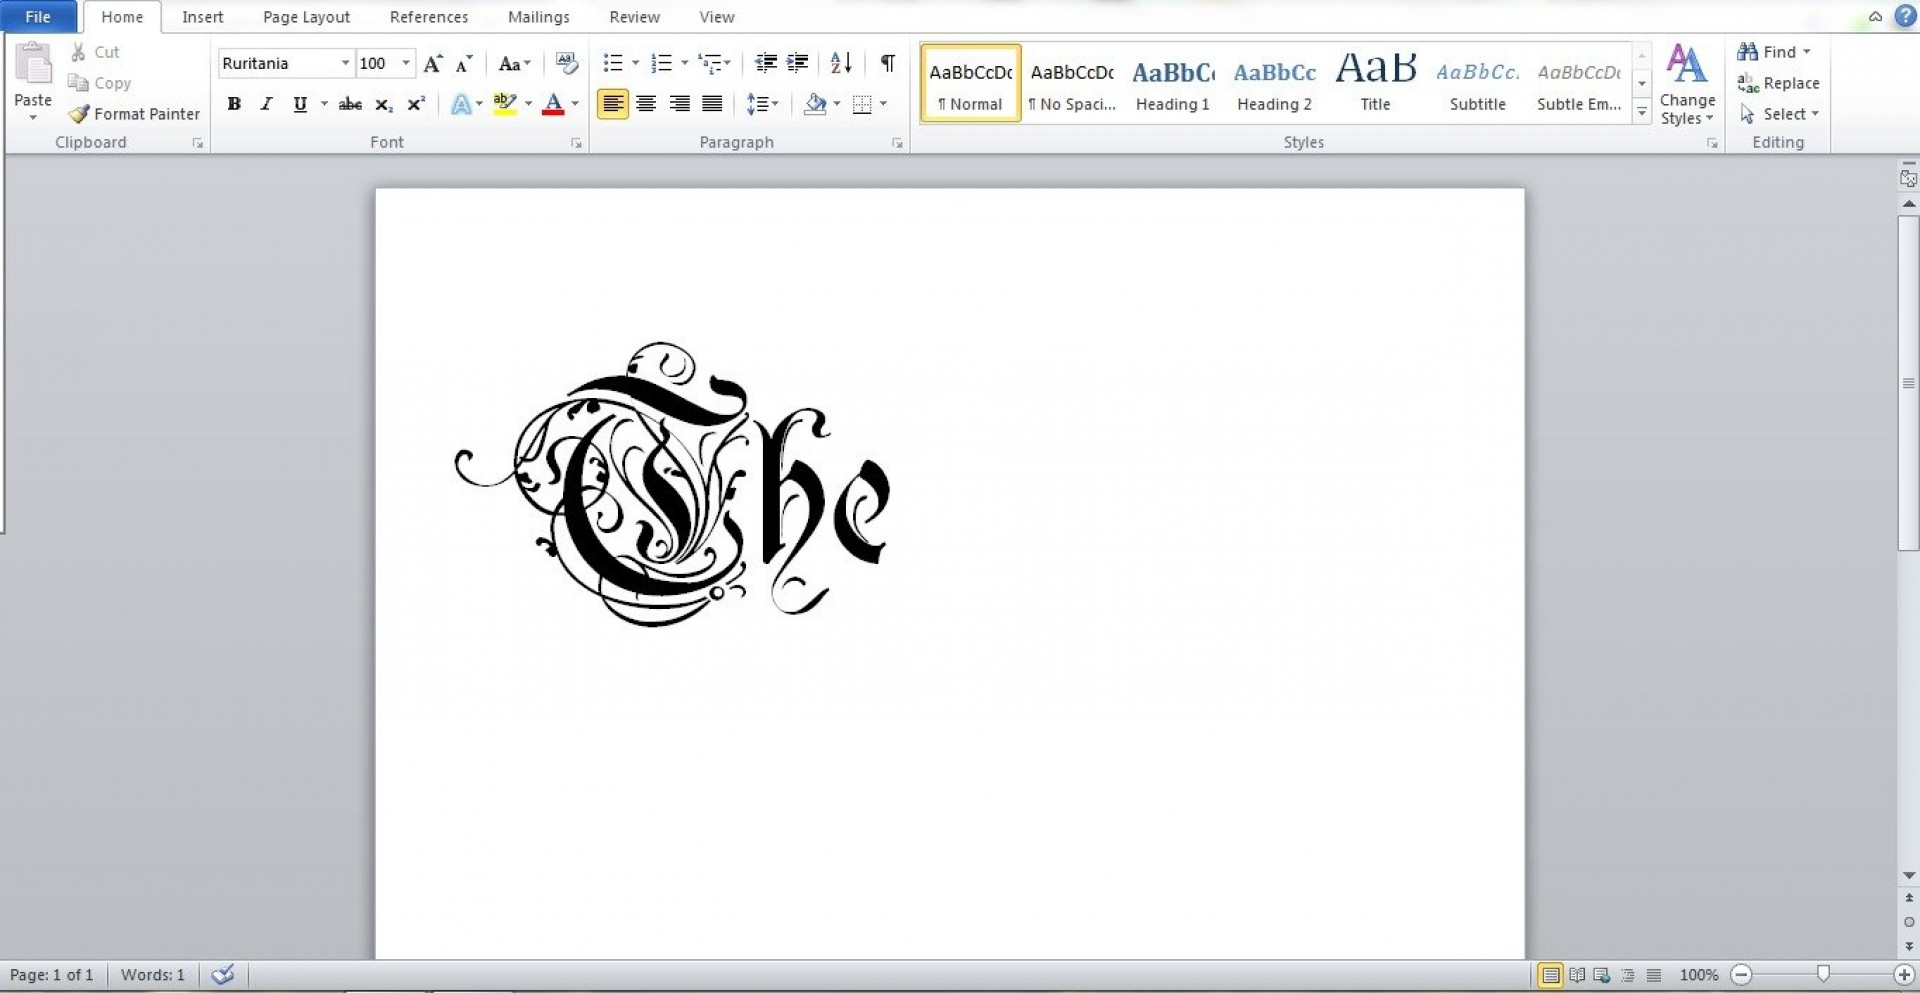 005 Essay Example Mraccj6 Font Stunning Size Formal Apa 1920